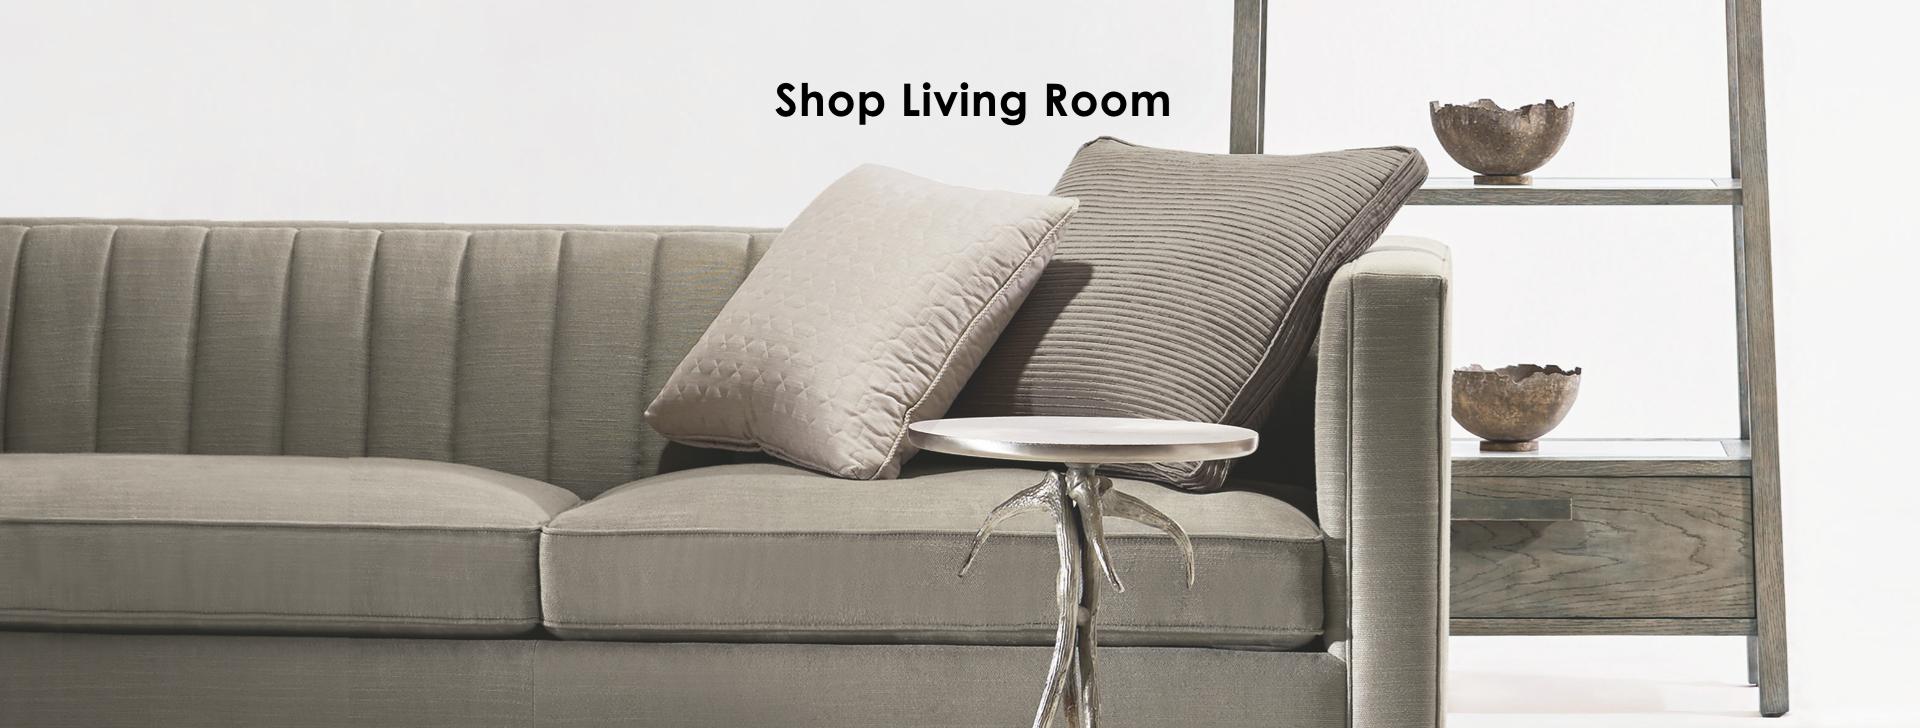 Living Room Furniture  C. S. Wo & Sons Hawaii